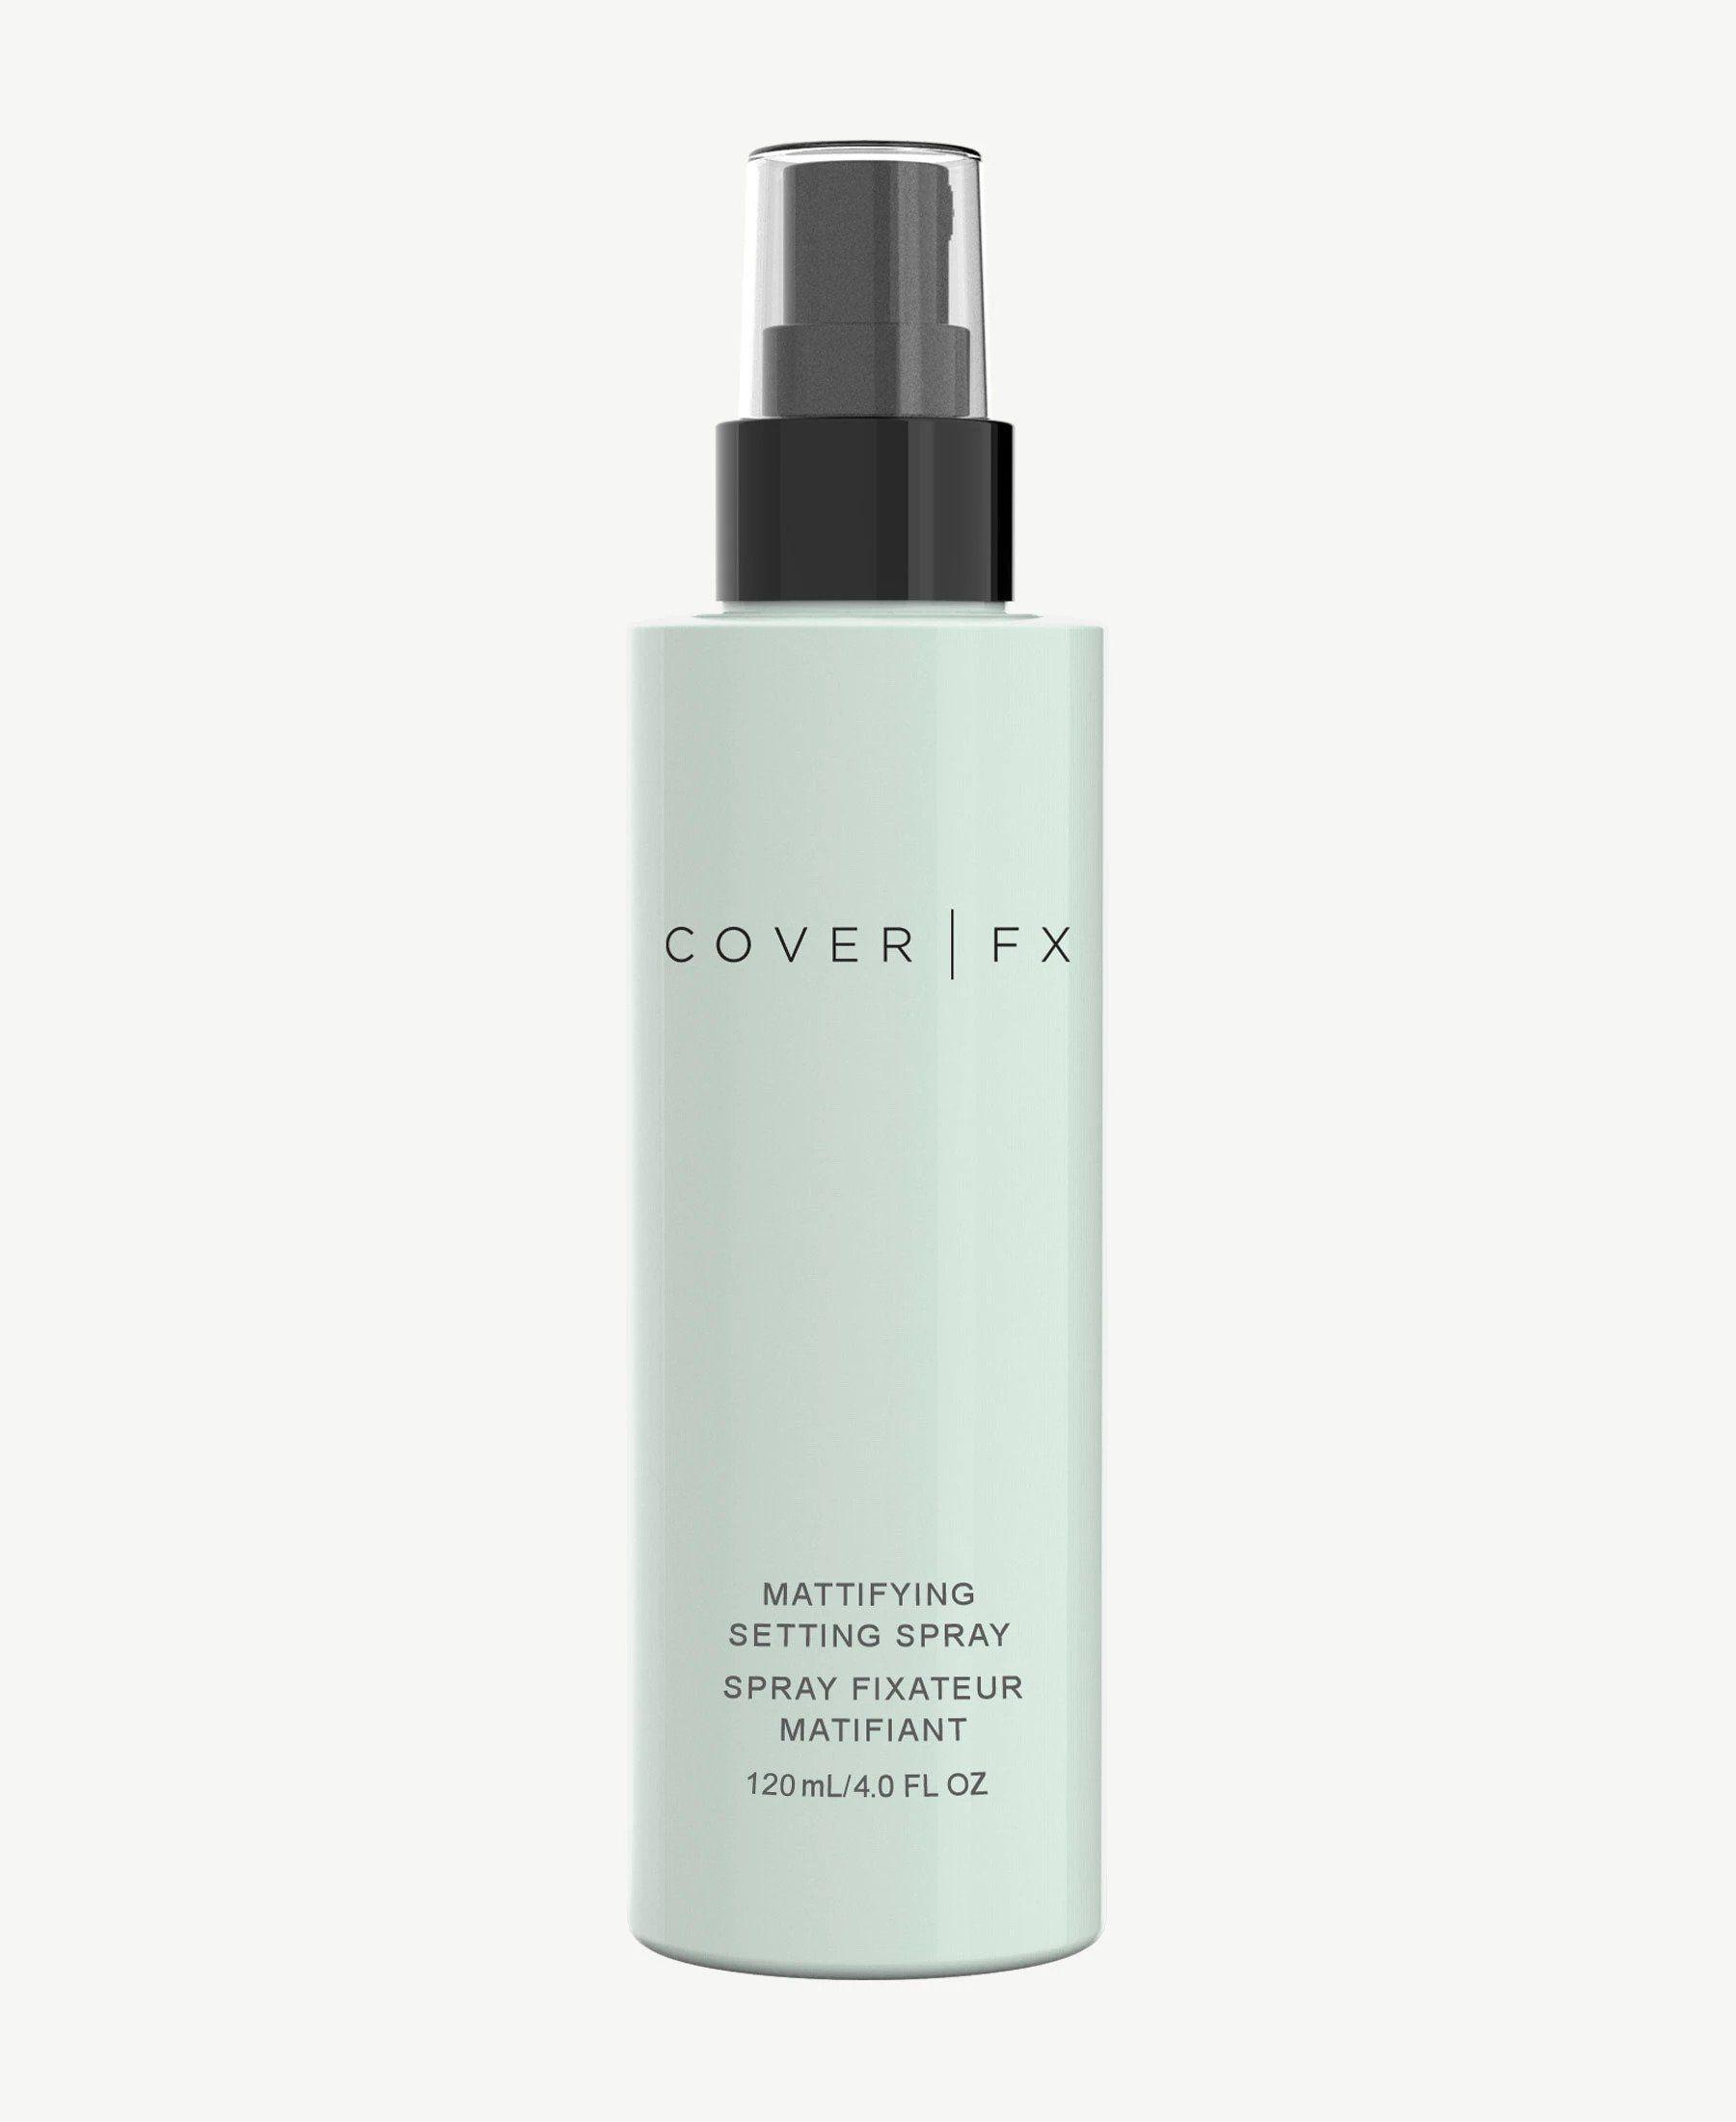 Cover FX Mattfying Setting Spray